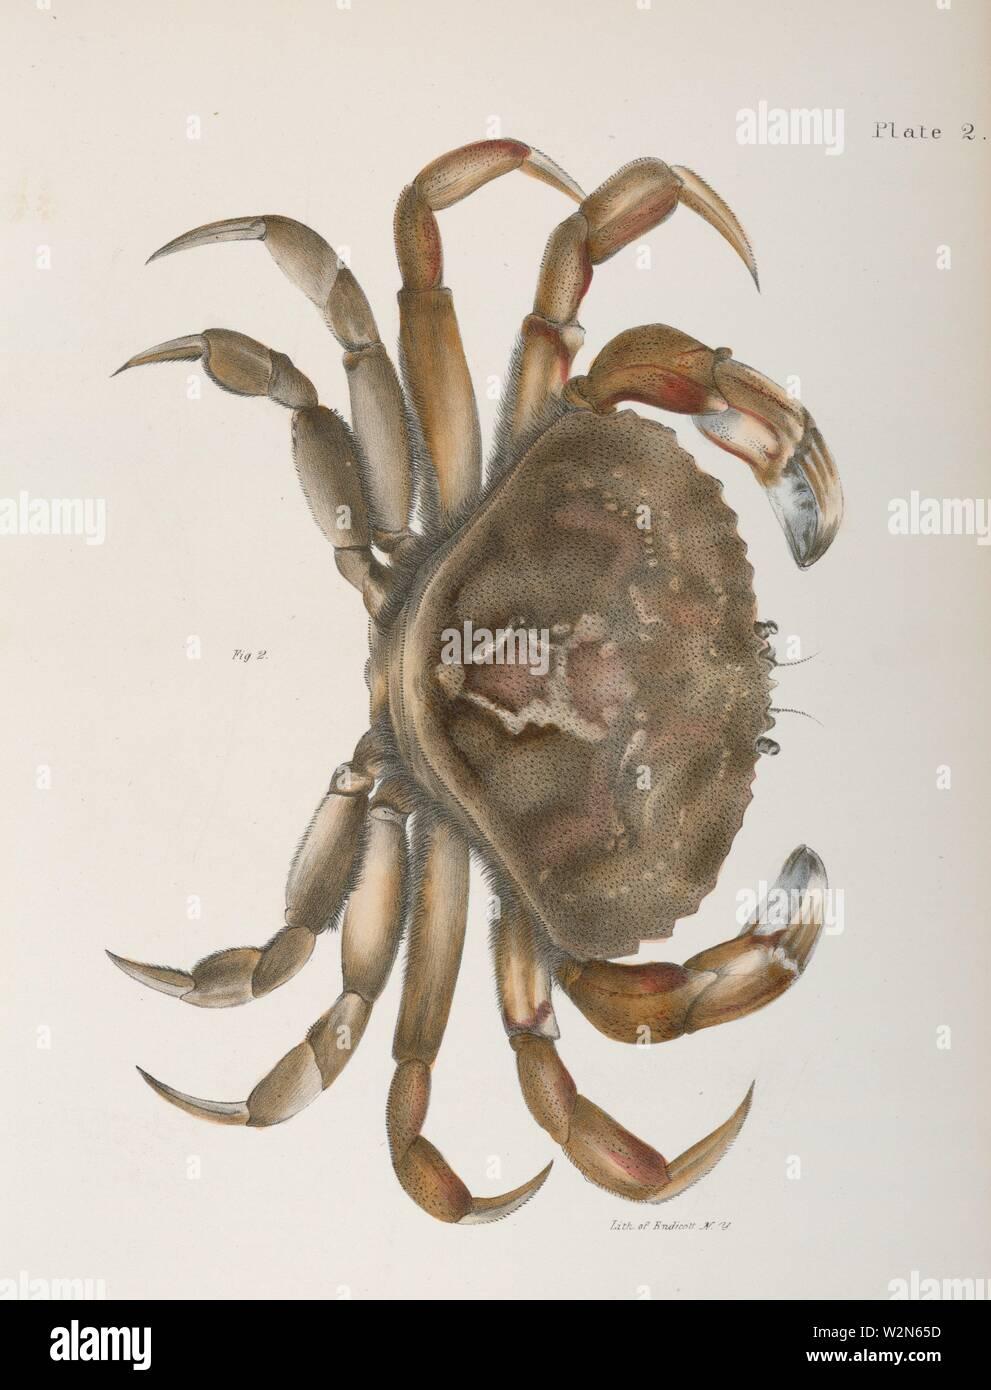 Crustacea 2. Platycarcinus irroratus. De Kay, James E. (James Ellsworth), 1792-1851 (Author). Zoology of New York: or, The New York fauna. Date Stock Photo